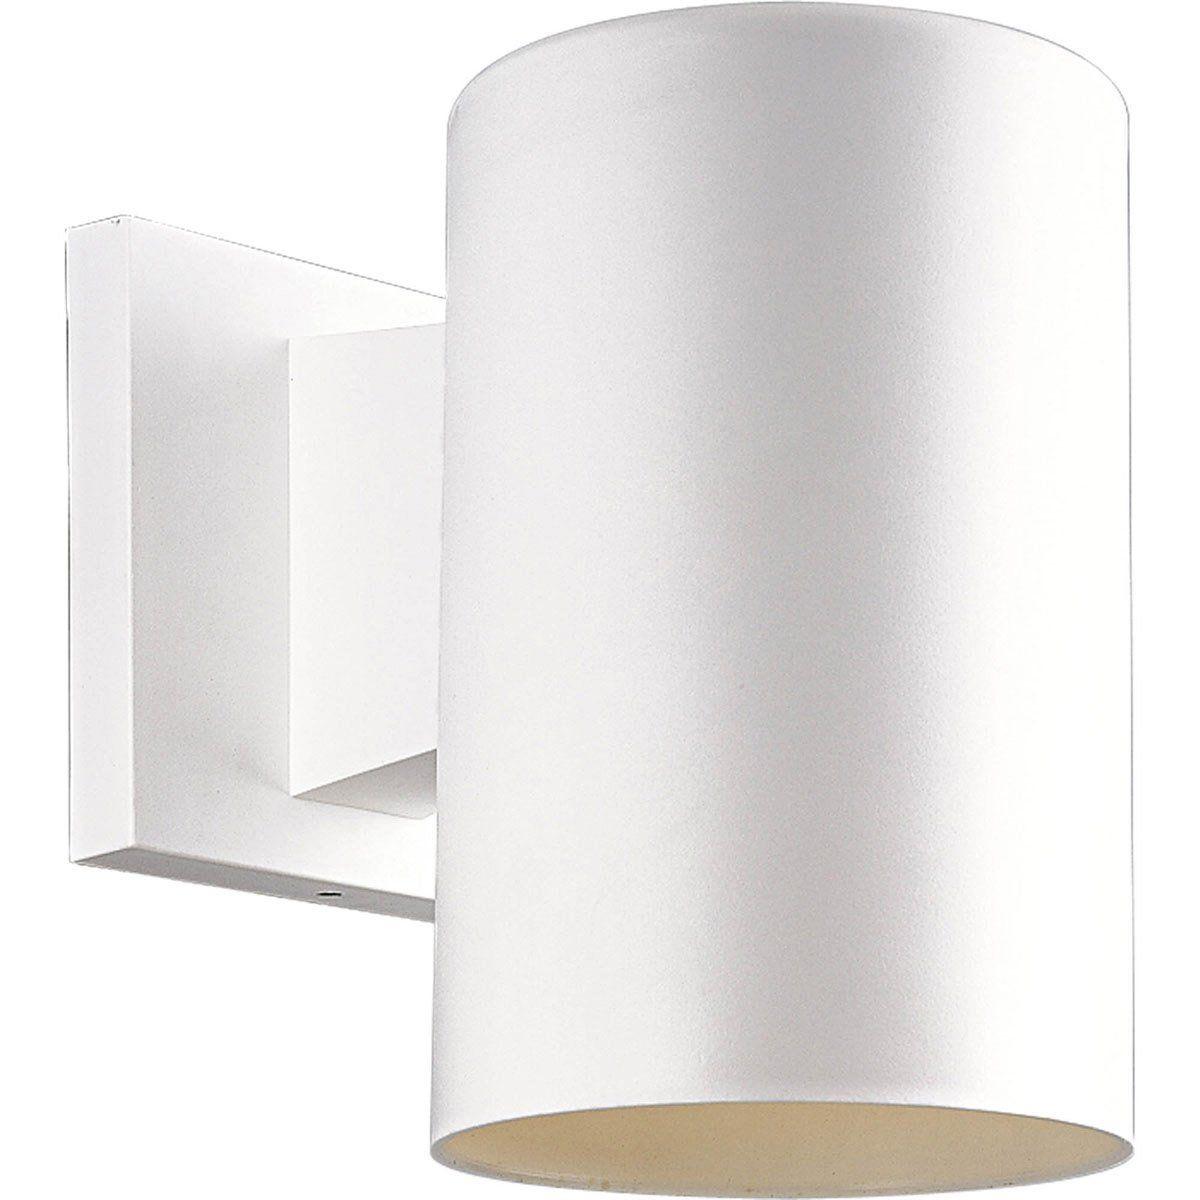 White Outdoor Lights Progress Lighting P571230 Cylinder 1 Light 7 Inch White Outdoor